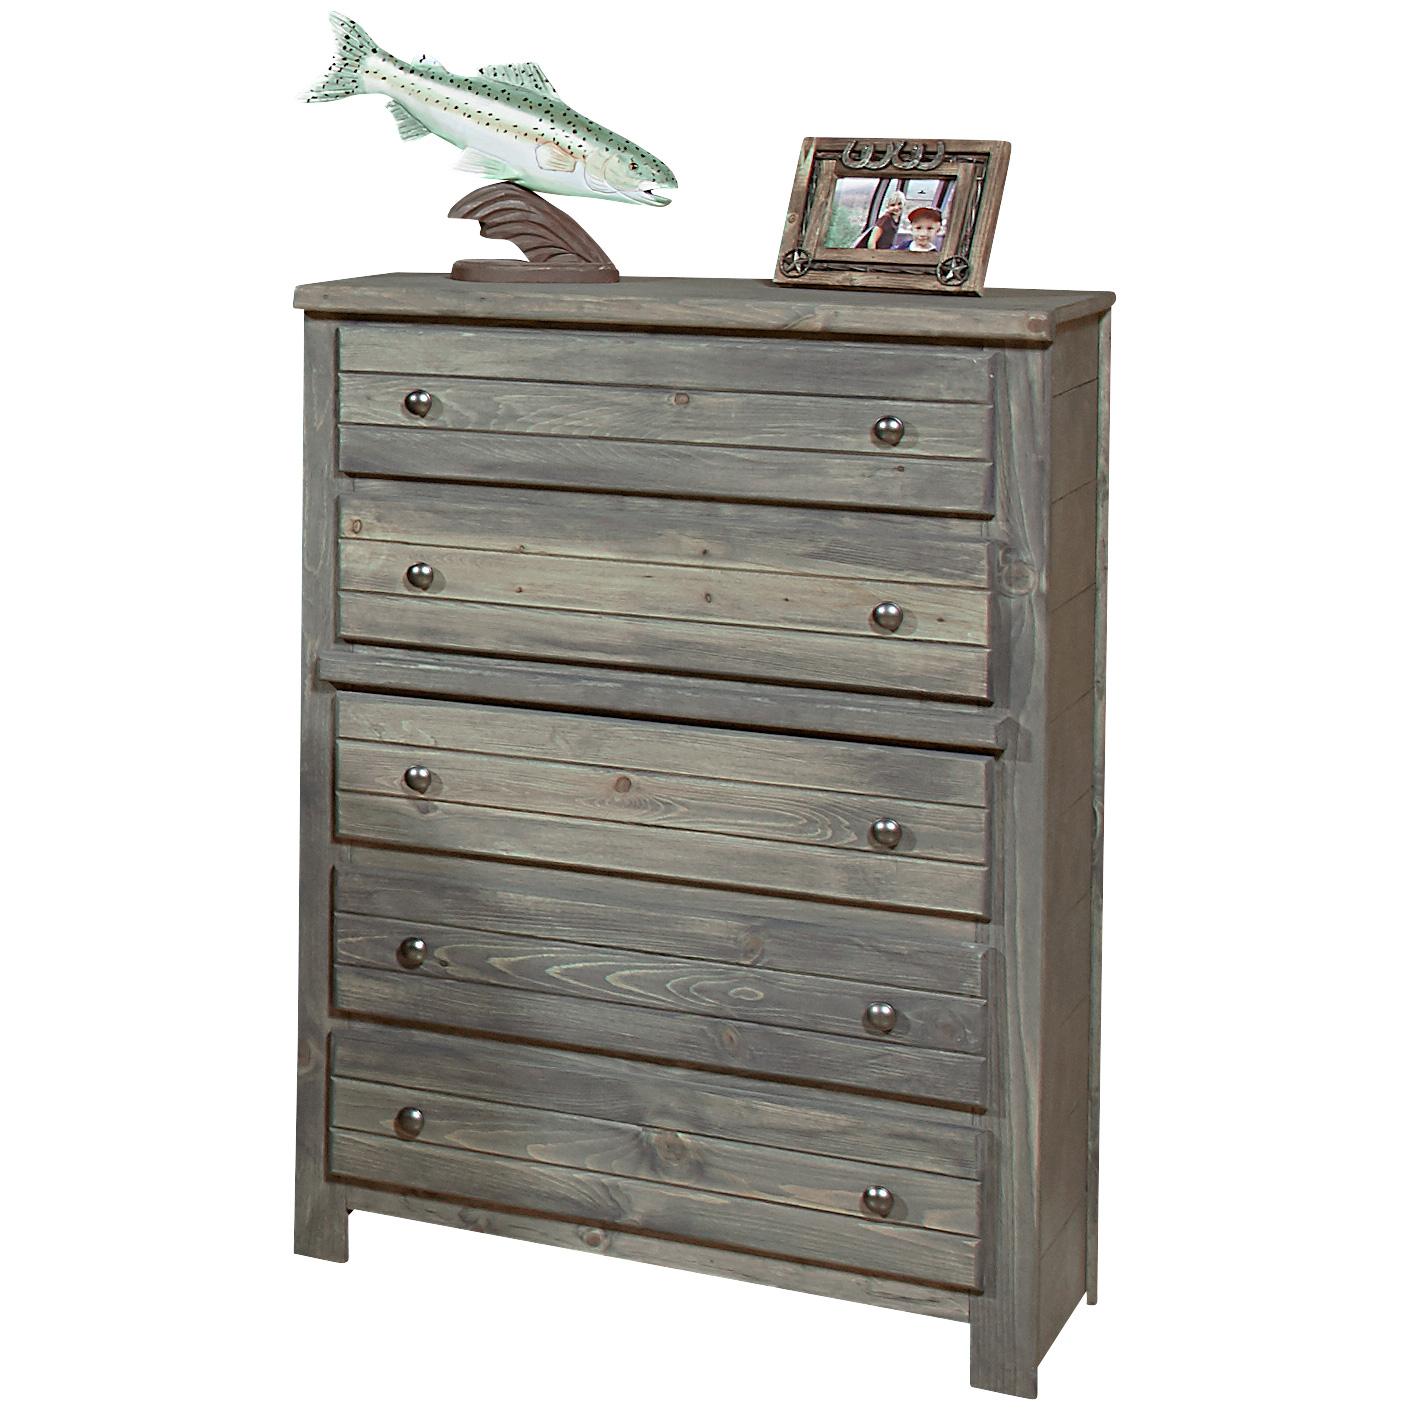 Trendwood Inc. | Bayview Driftwood 5 Drawer Chest